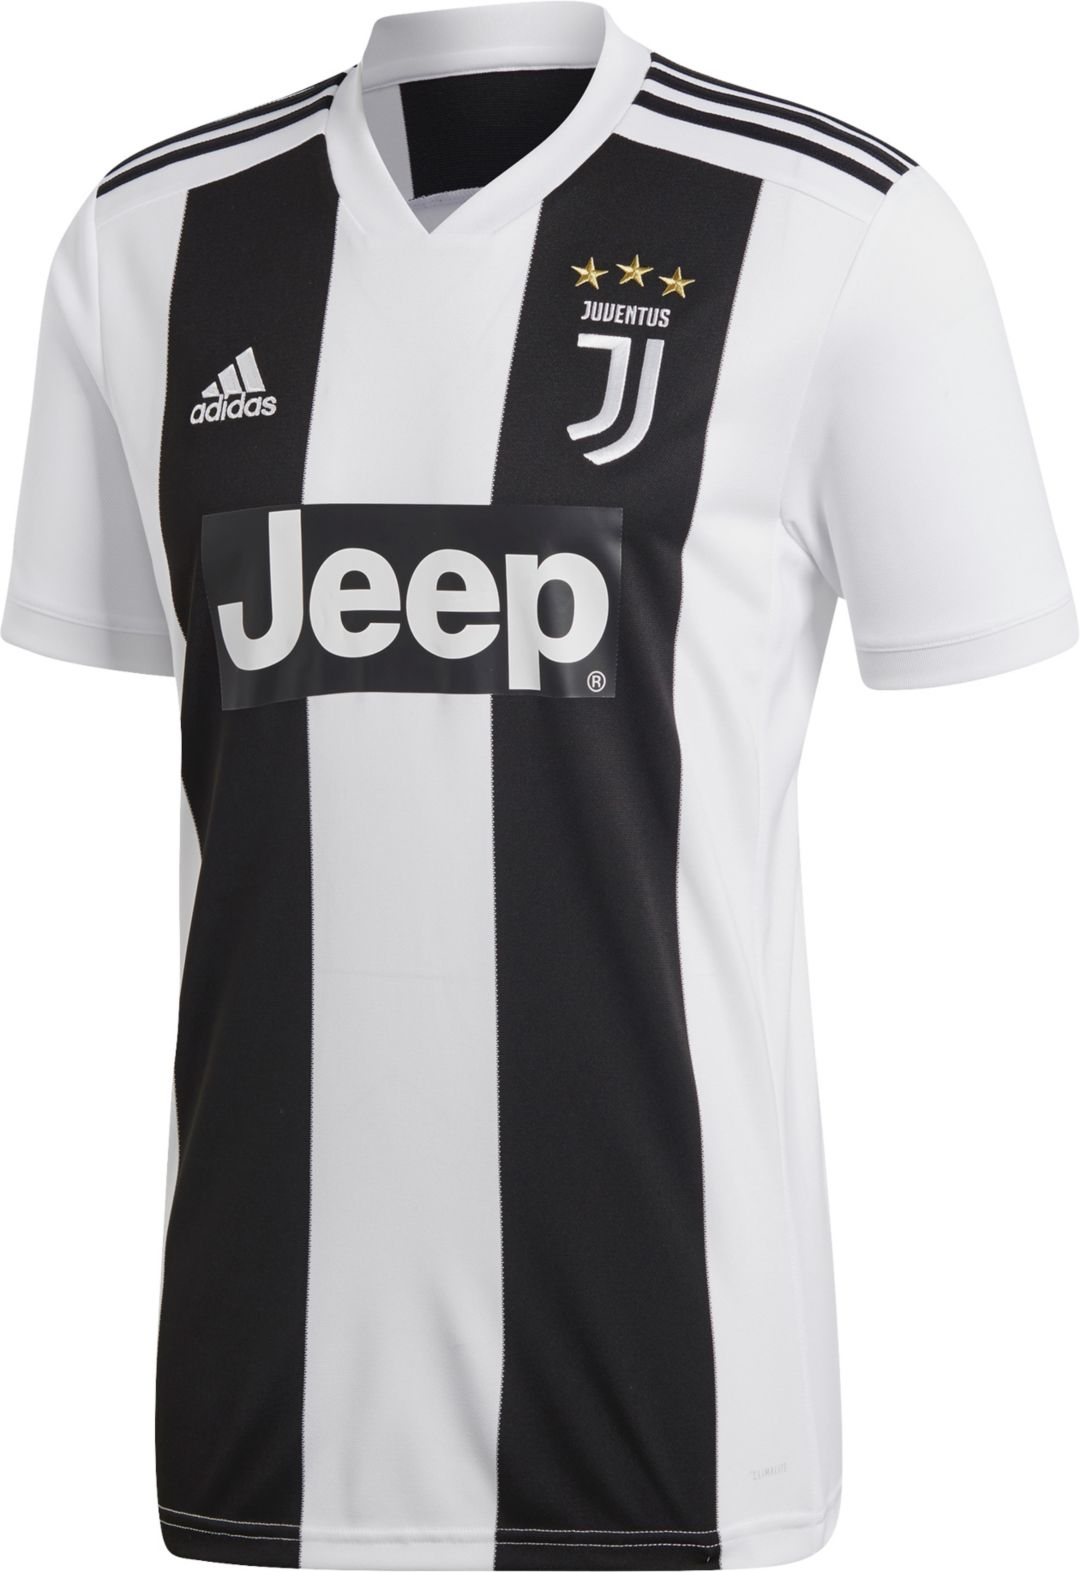 new concept d649f a219a adidas Youth Juventus Stadium Cristiano Ronaldo #7 Home Replica Jersey